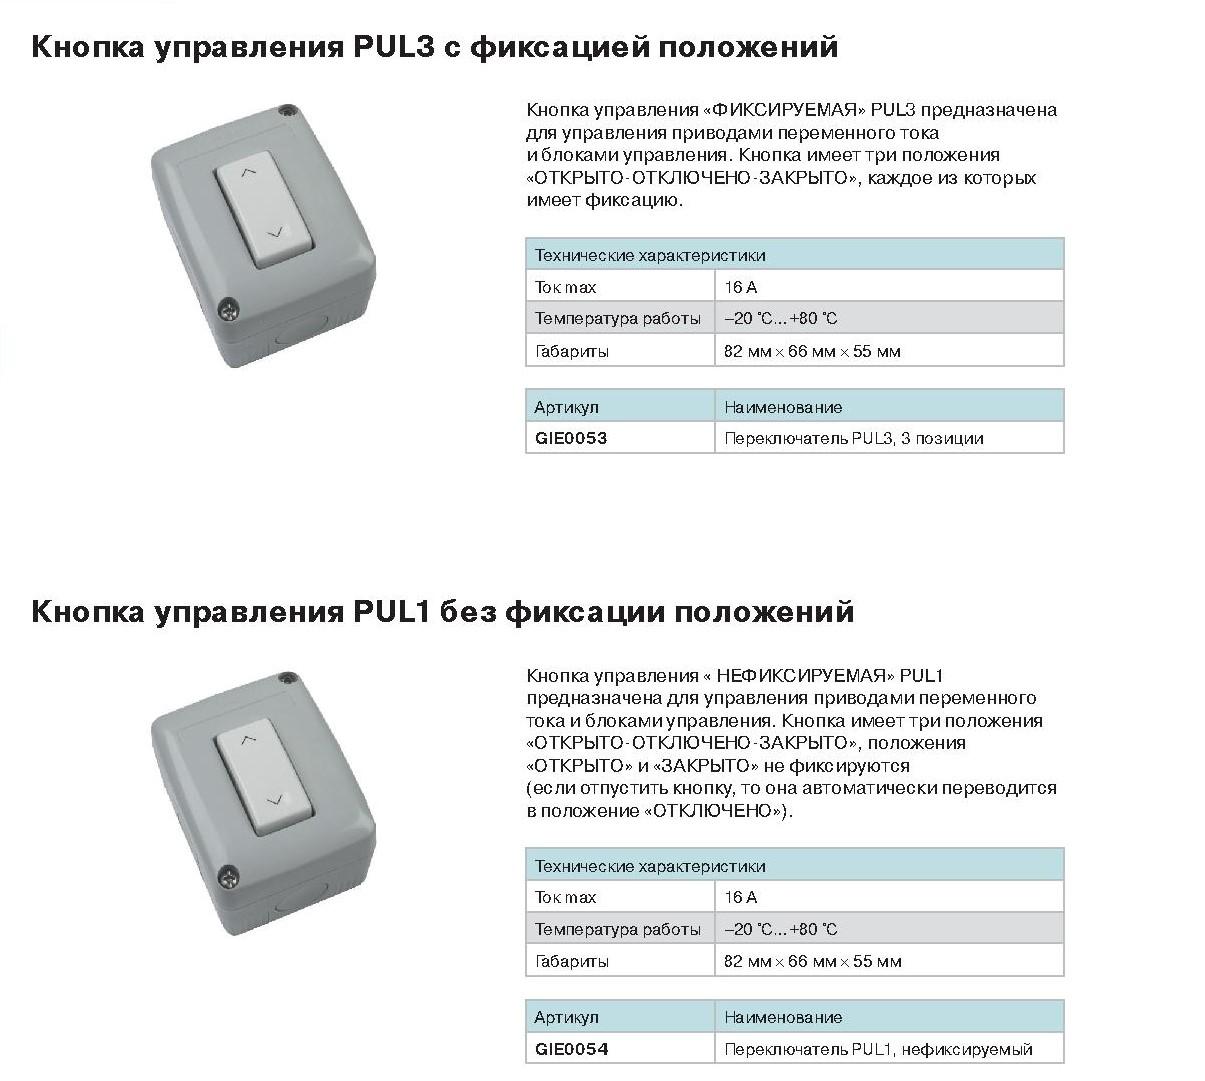 кнопка pul 1